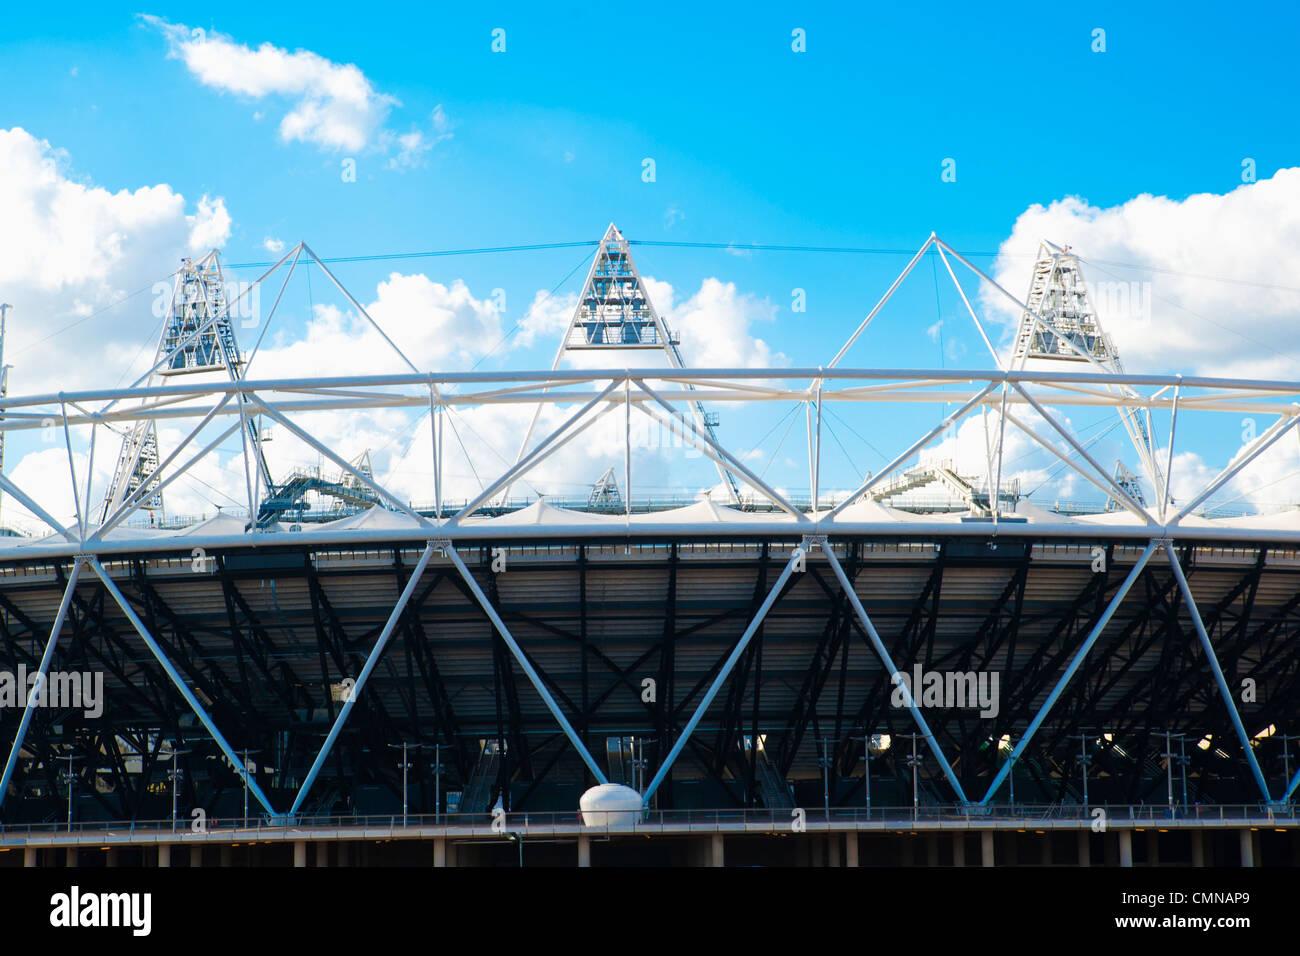 Olympic Stadium London, 2012, U.K. Stock Photo